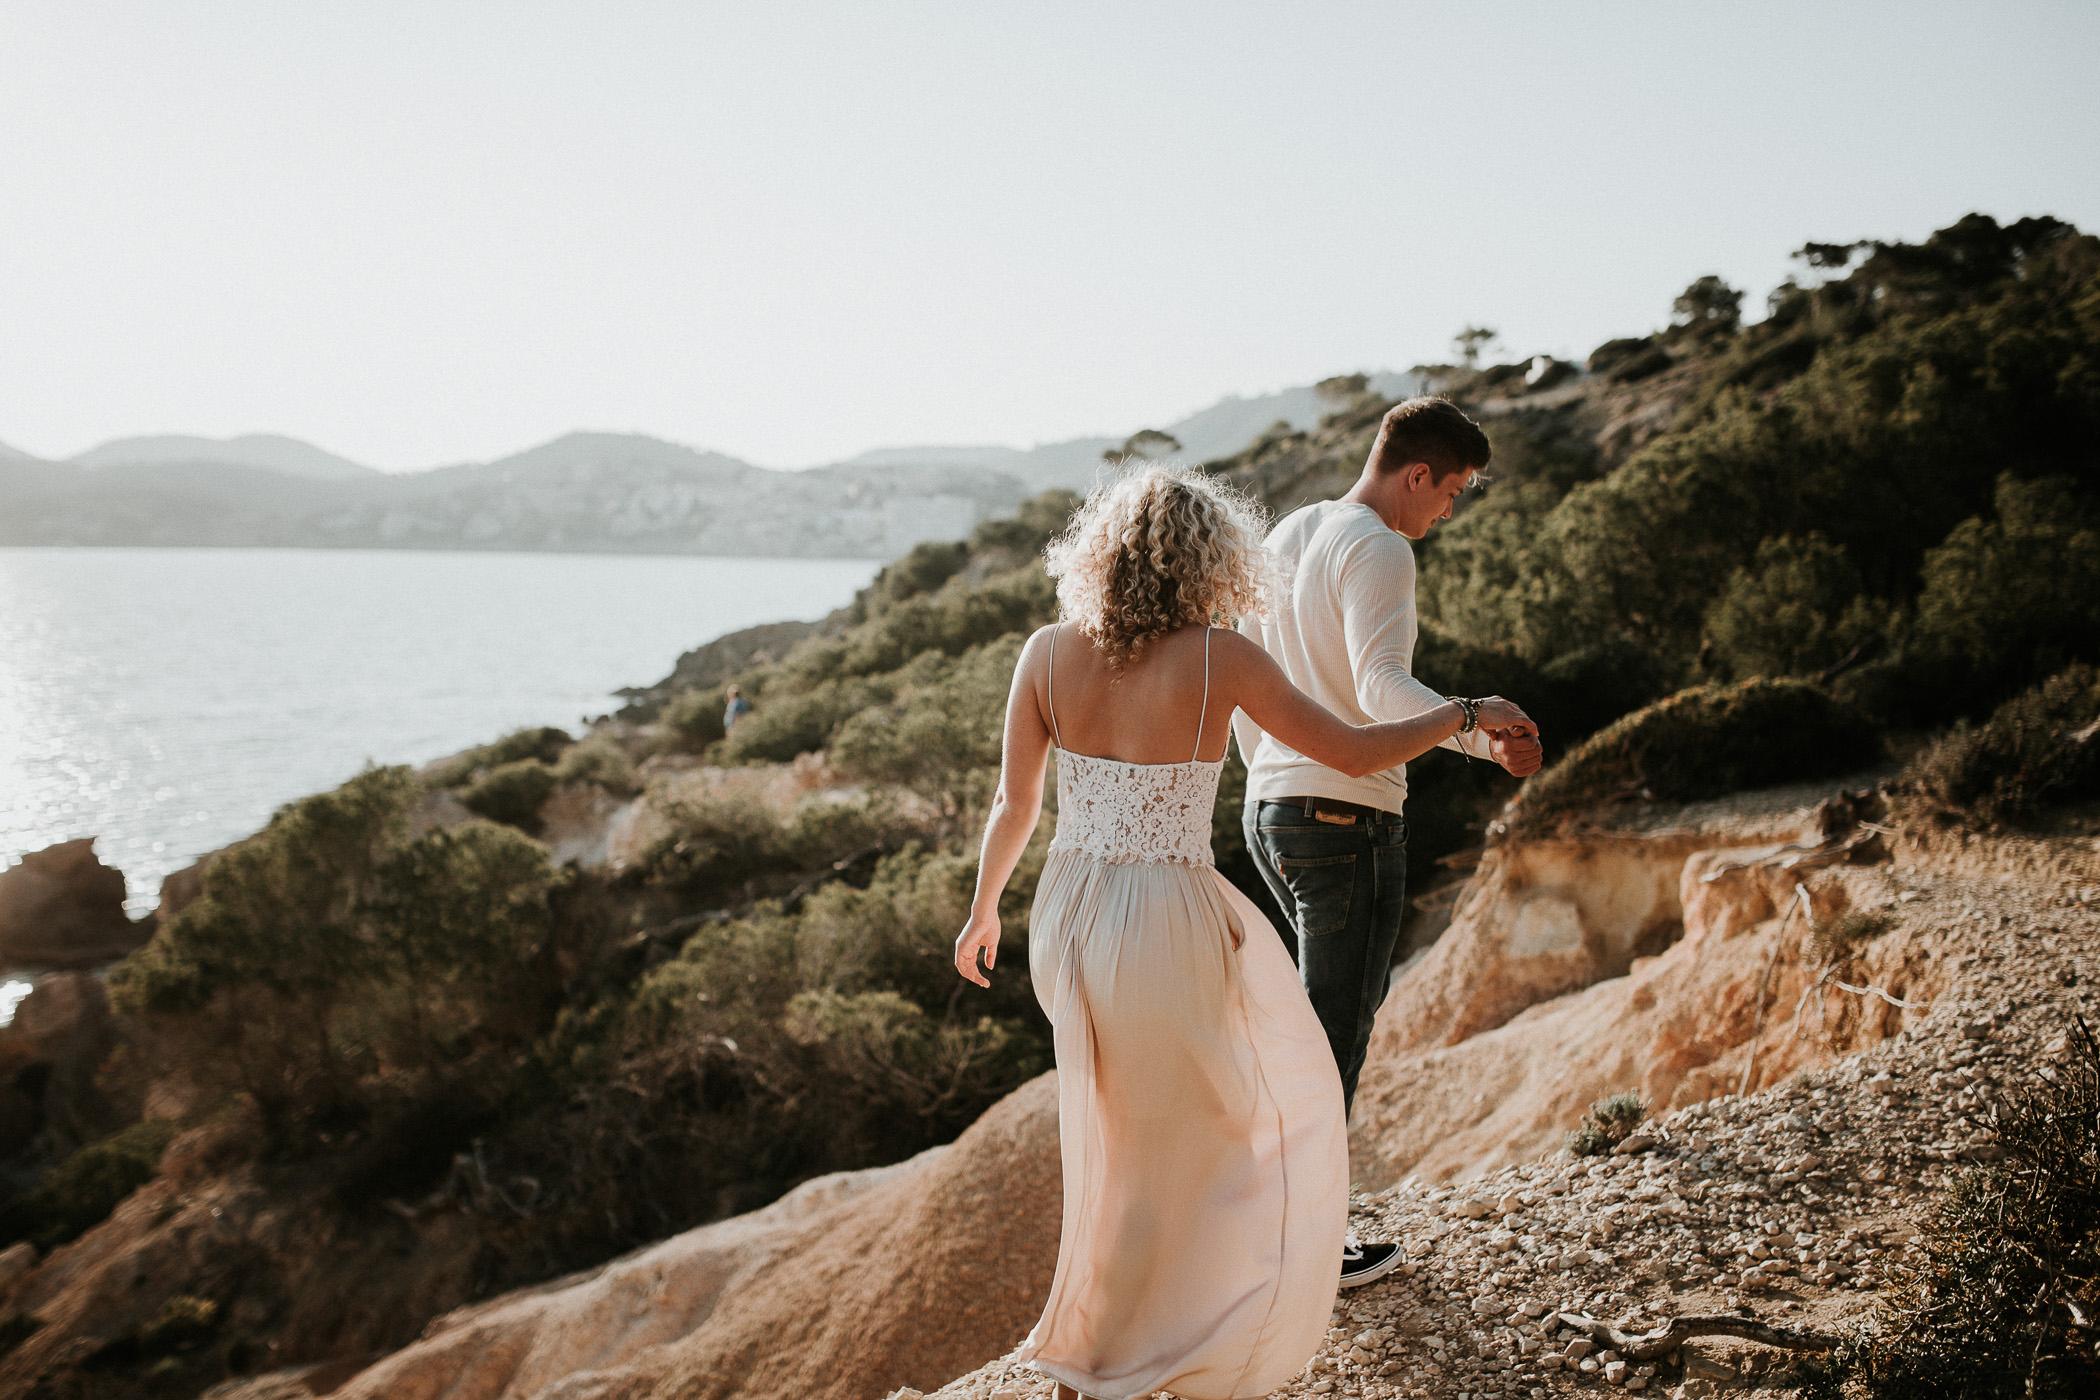 DanielaMarquardtPhotography_elopement_mallorca_spain_paguera_palma_charlyandbela_46